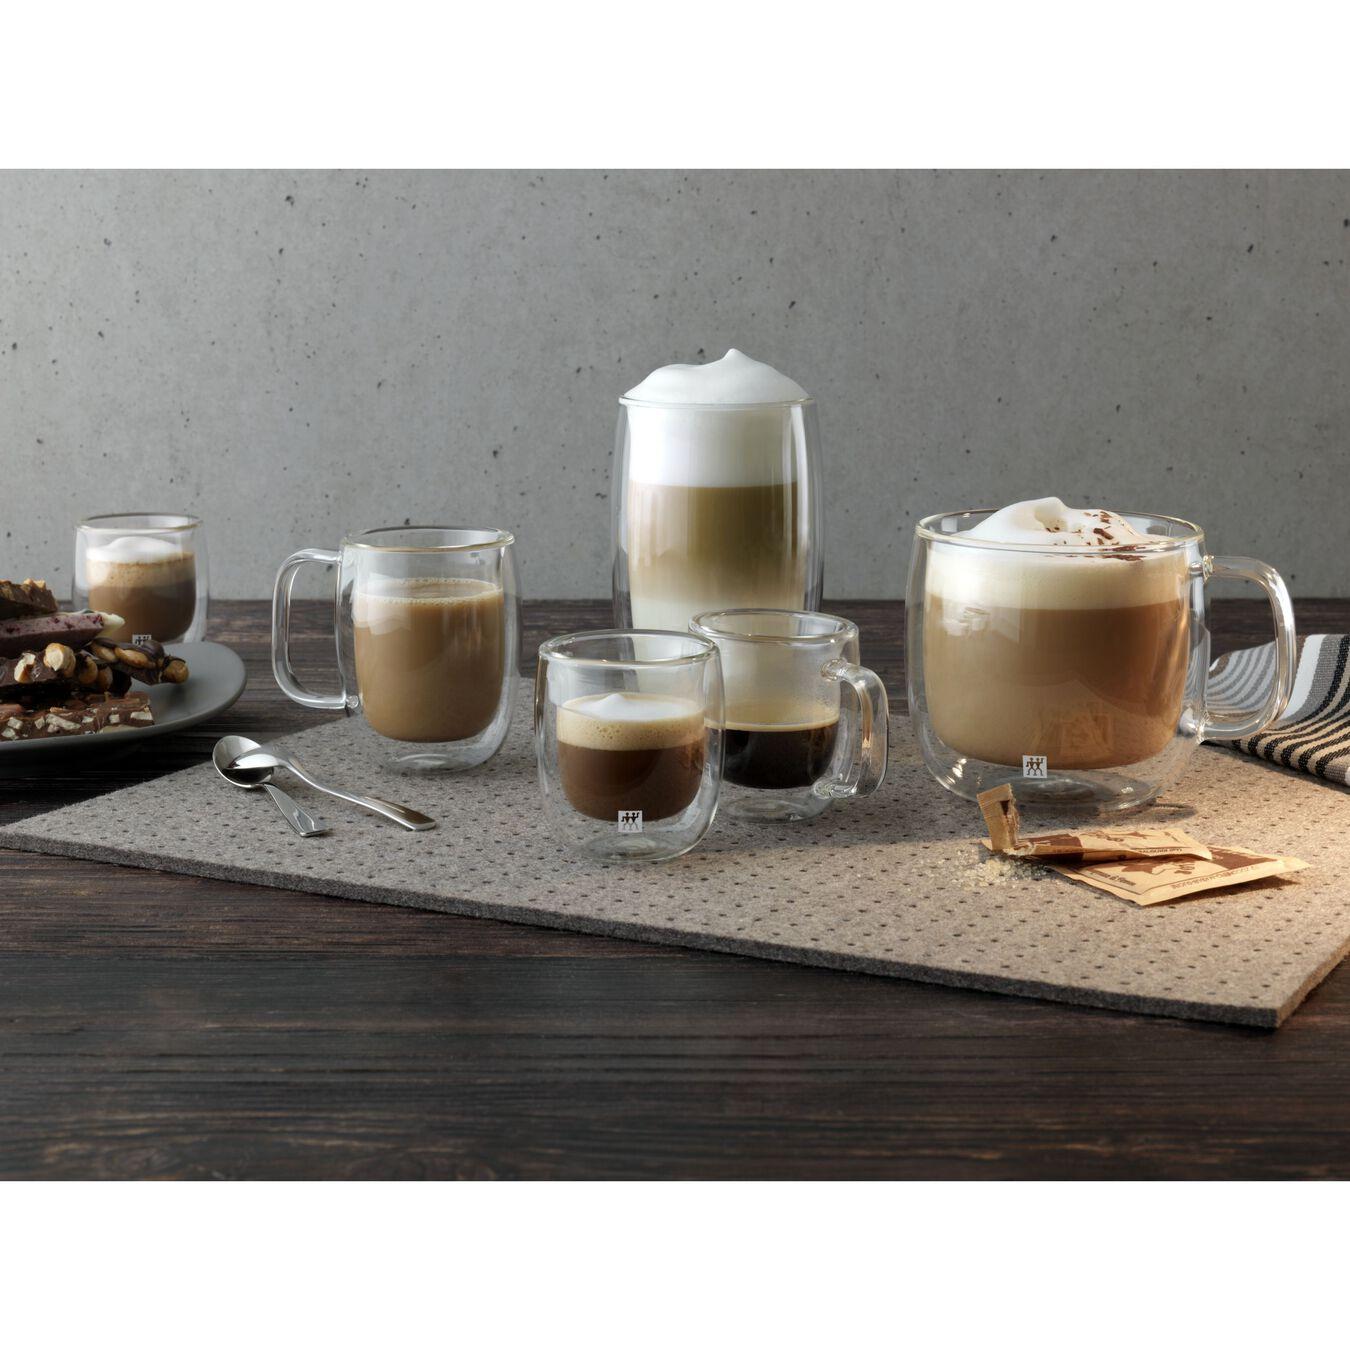 8 Piece Coffee glass set - Buy 6 Get 8,,large 4